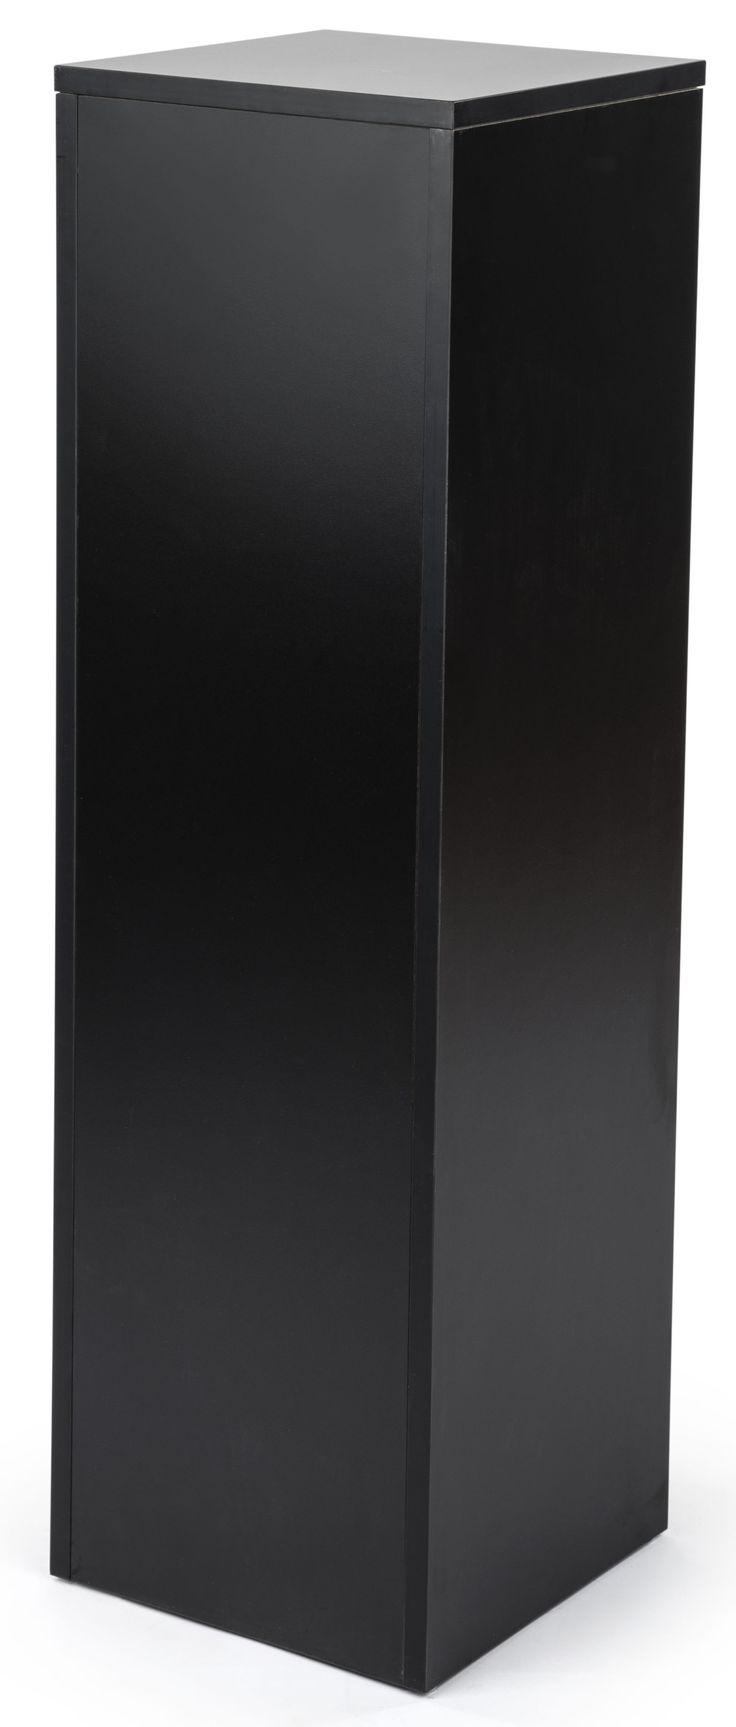 42h Portable Pedestal For Floor 12 5 Square Top Collapsible Melamine Black Display Pedestal Simple Storage Black Floor